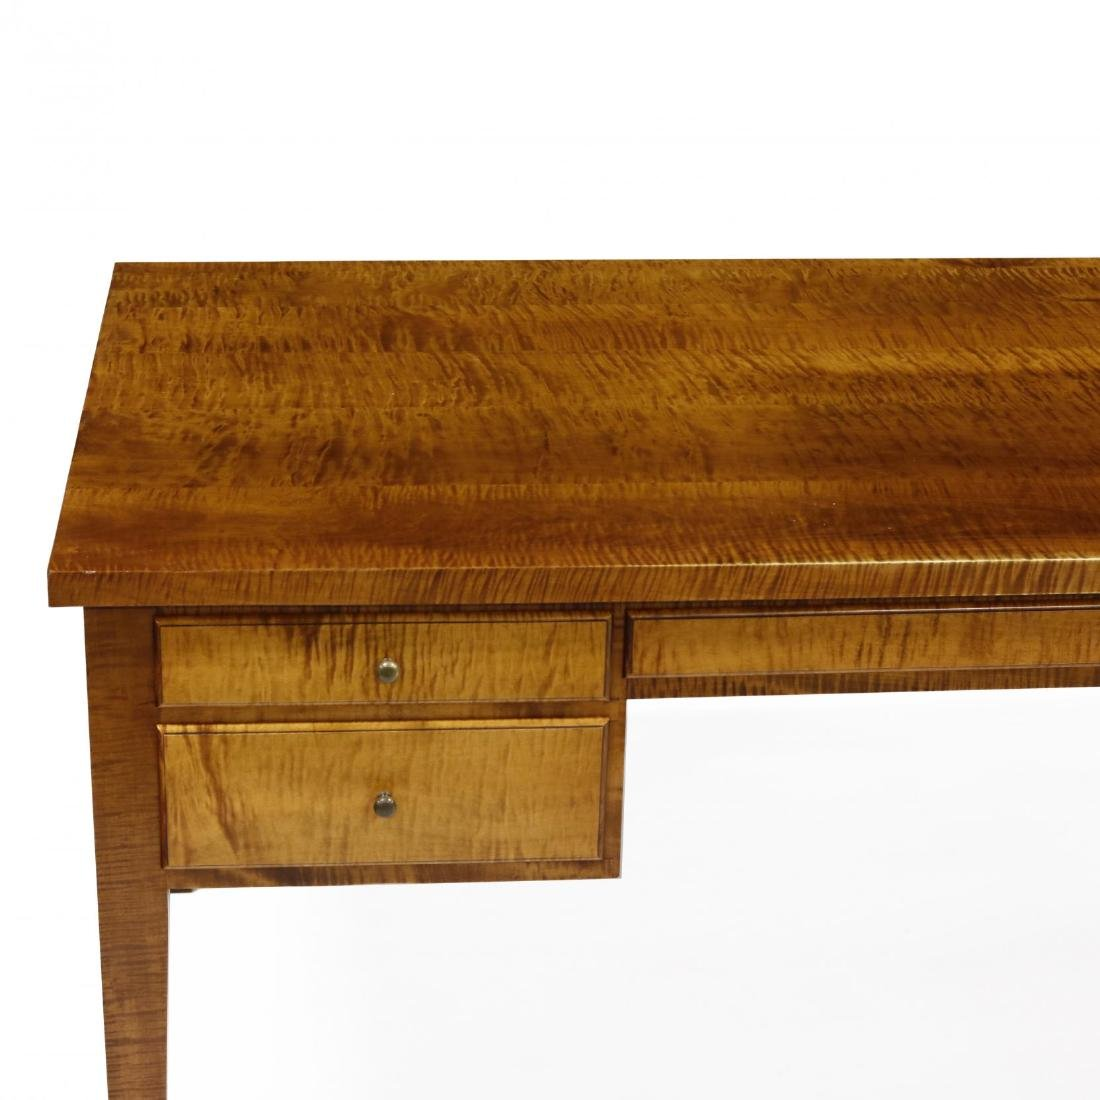 Barton Sharpe, Custom Tiger Maple Executive Desk and - 4